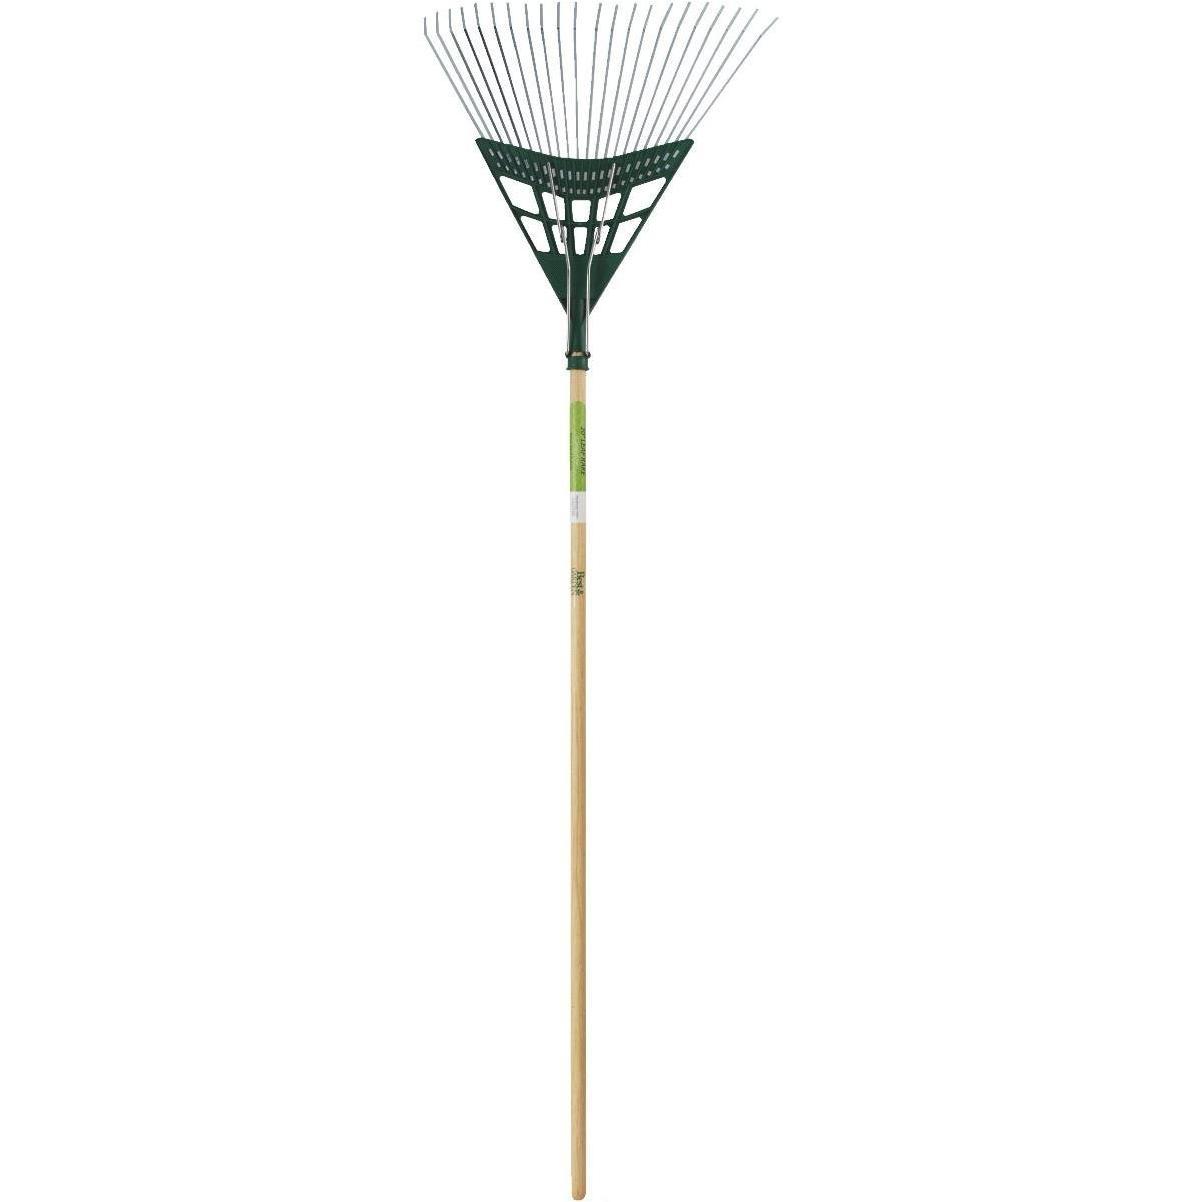 Steel Garden Leaf Rake with Extra Grabber Head Adjustable Lightweight Aluminum Handle Steel Head 25 Tines 96.5 to 145 cm Silver Handle